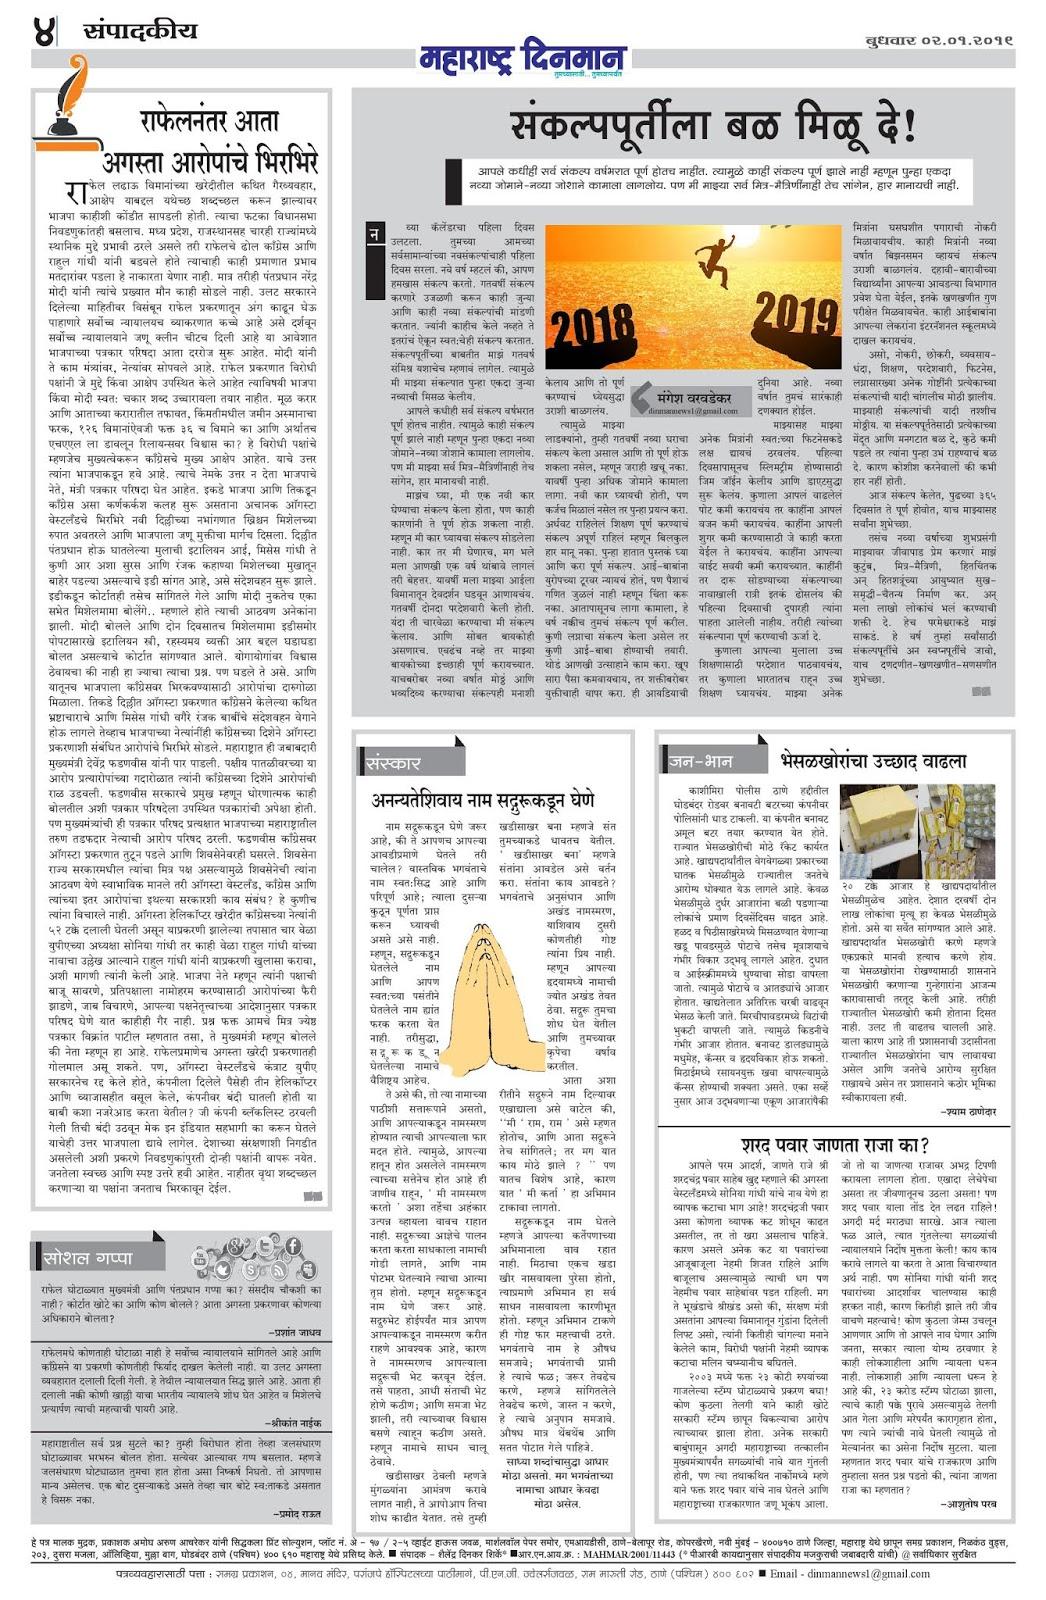 Thane Marathi Daily Newspaper Maharashtra Dinman 02-01-2019, Page 4